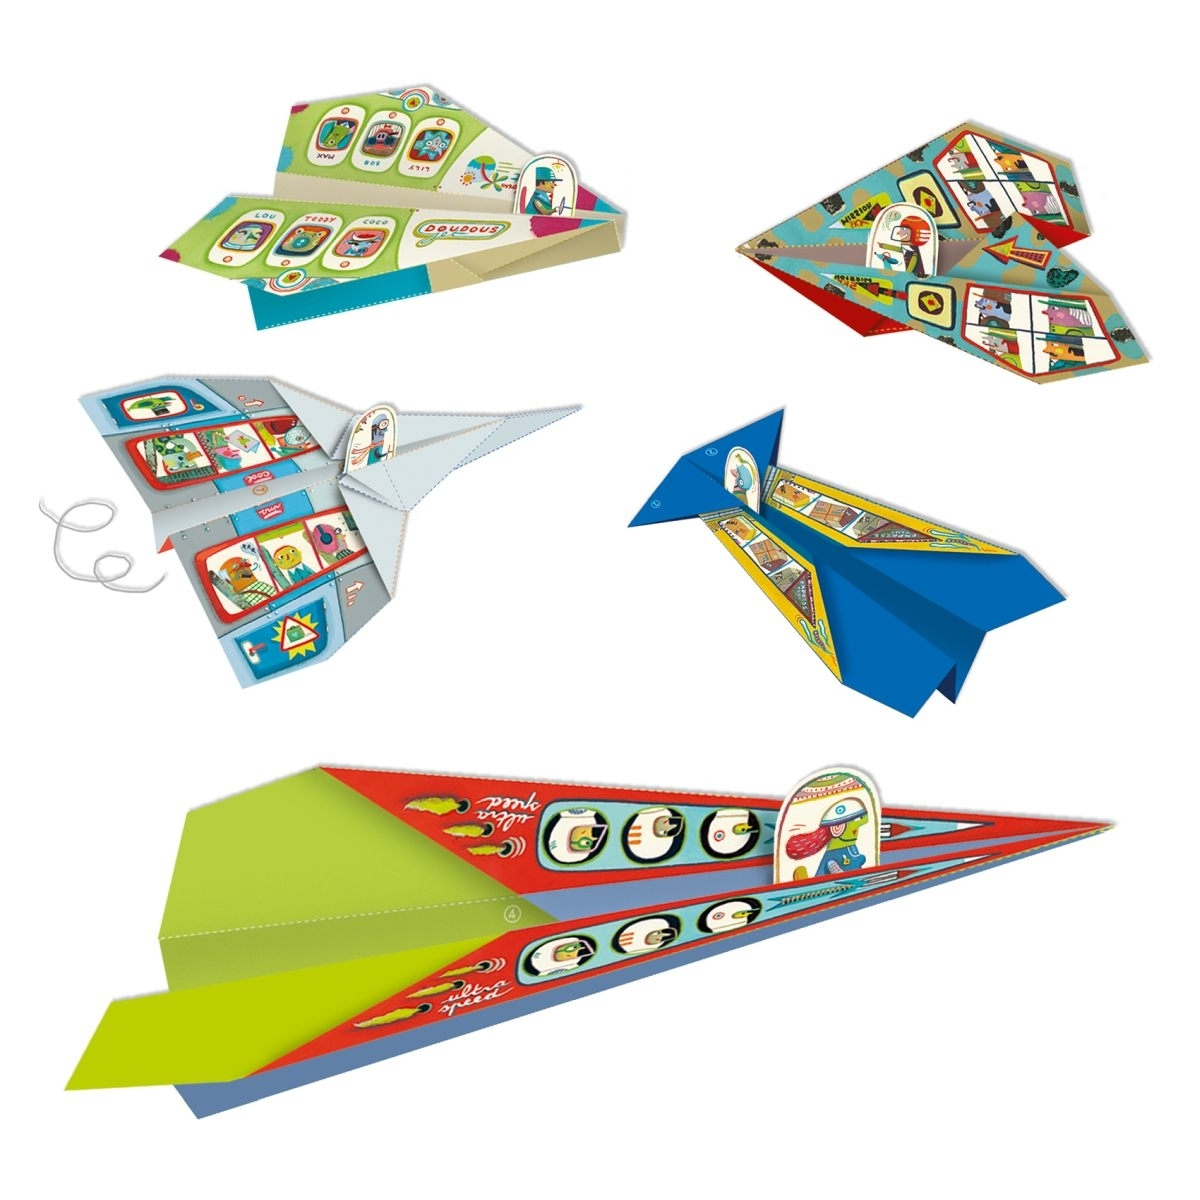 Djeco Papierflieger ab 7 Jahren